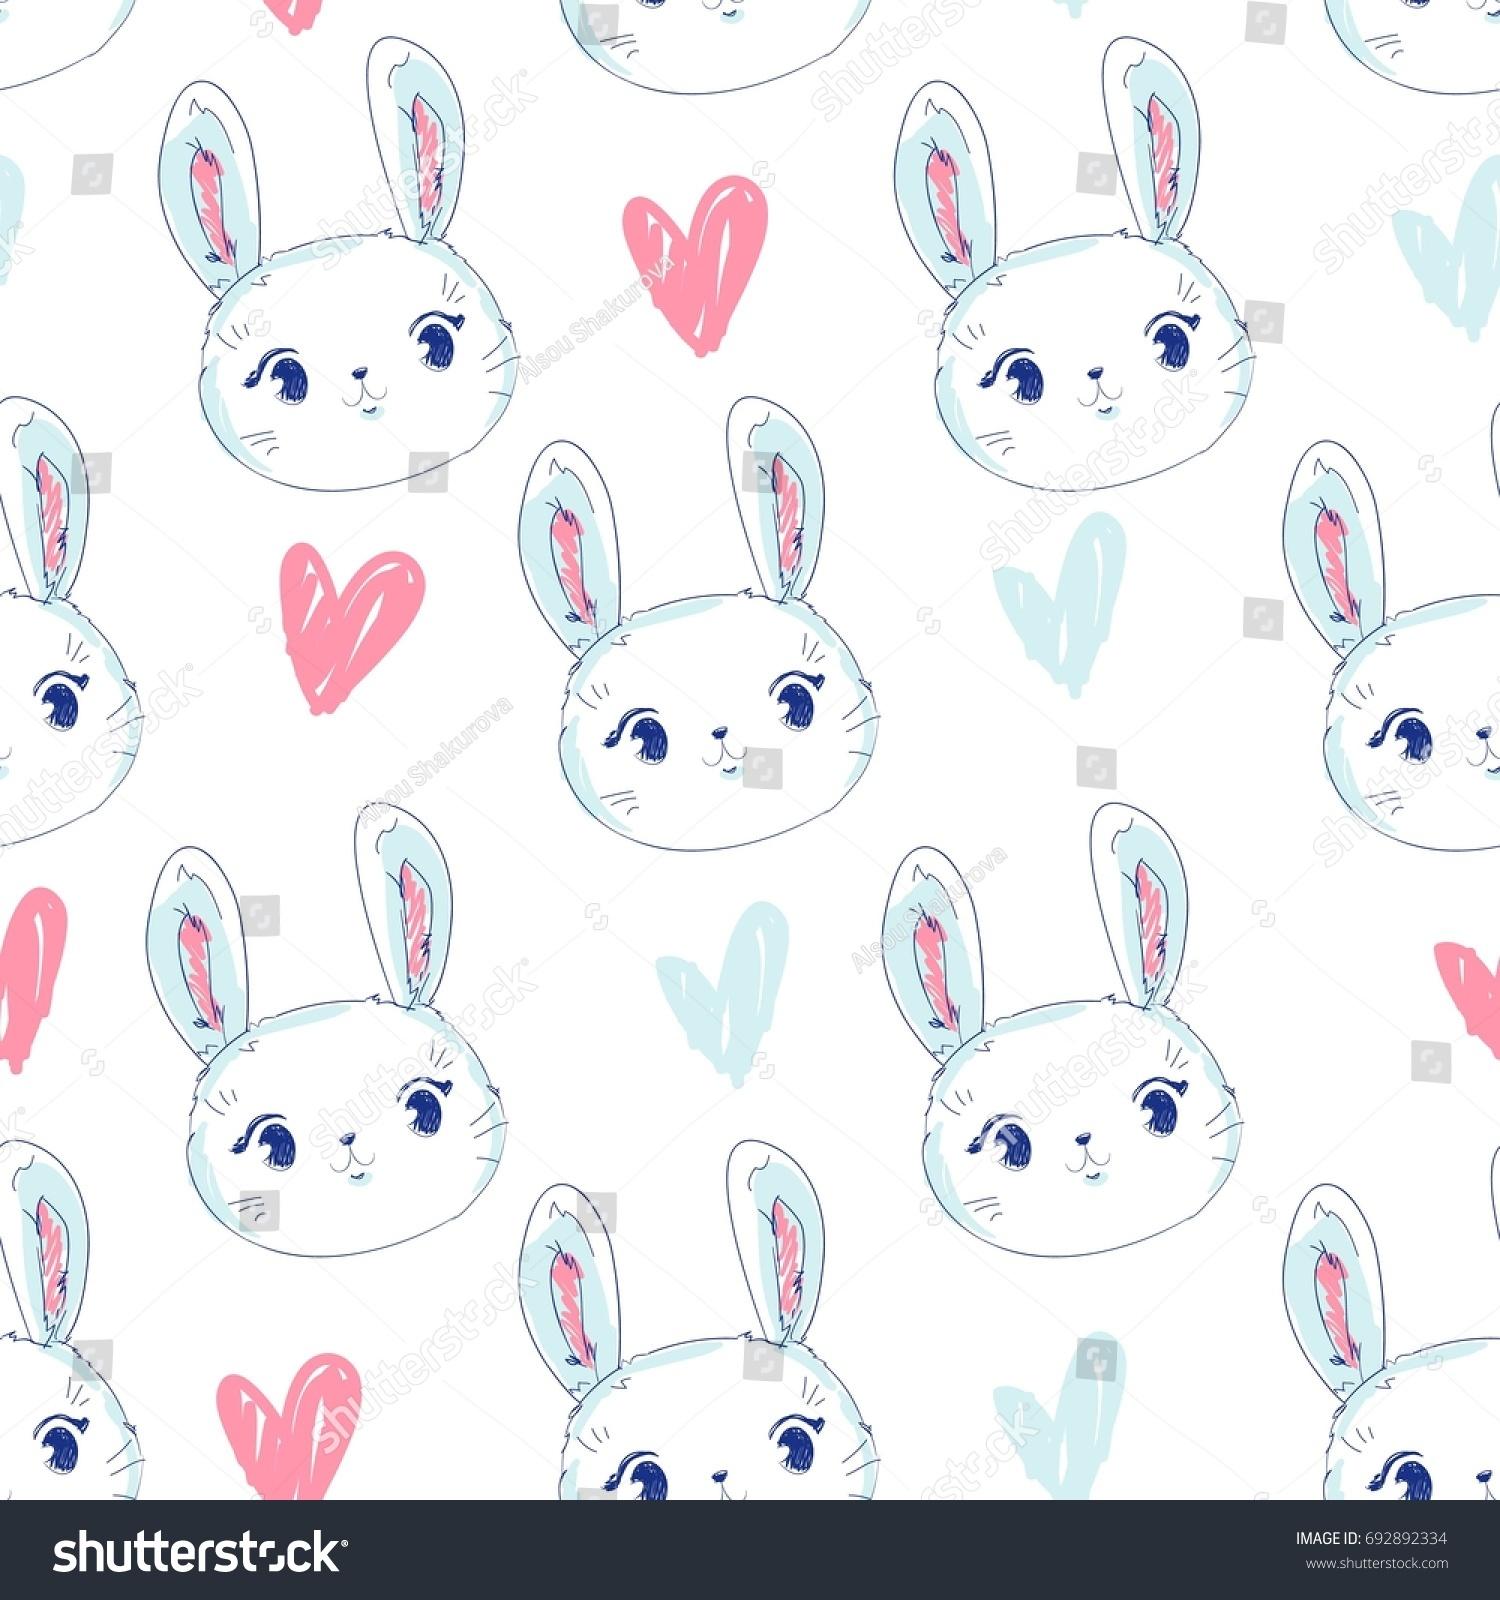 Hand Drawn Cute Bunny Vector Rabbit